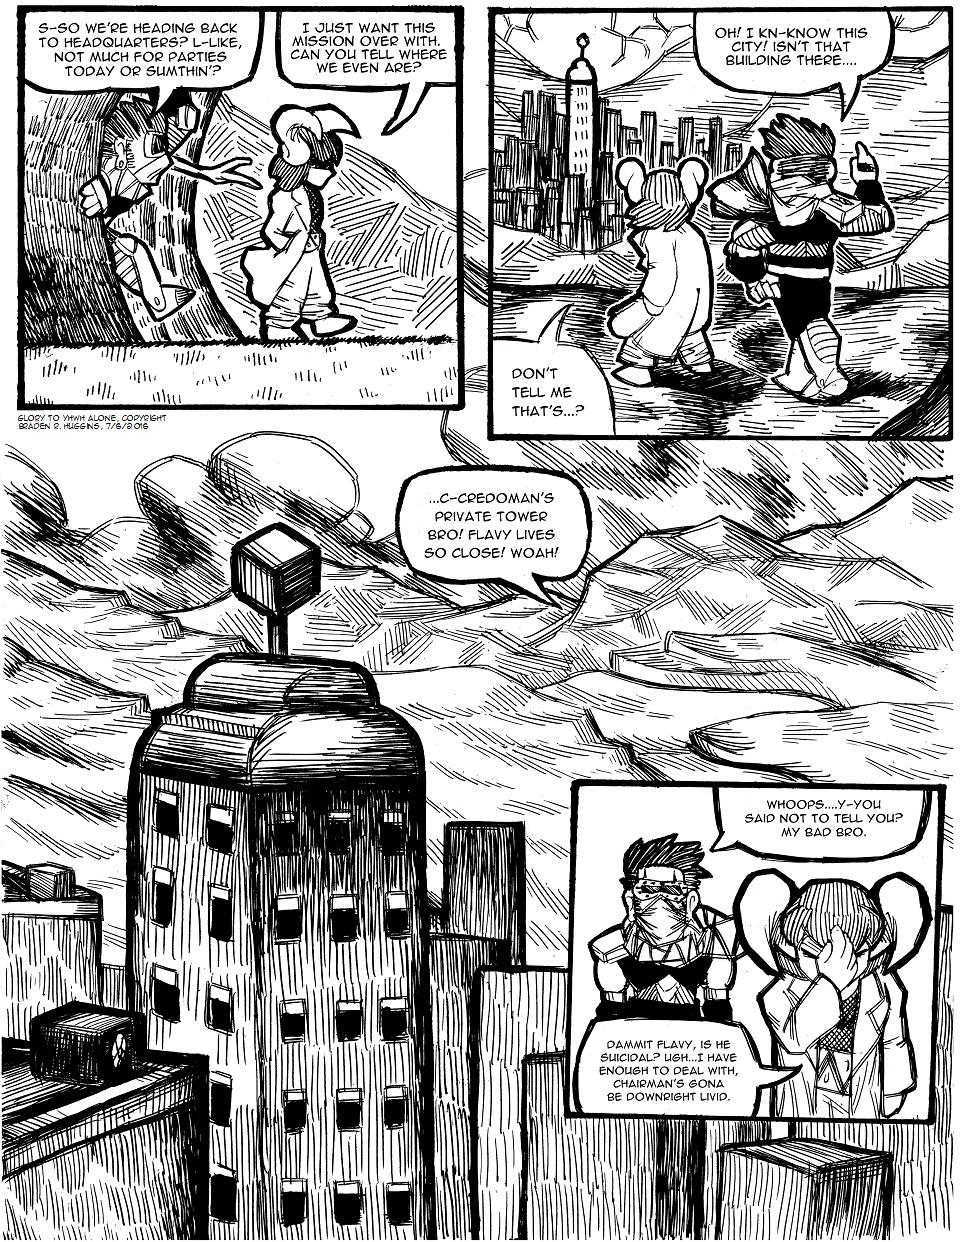 218: Credoman's Tower